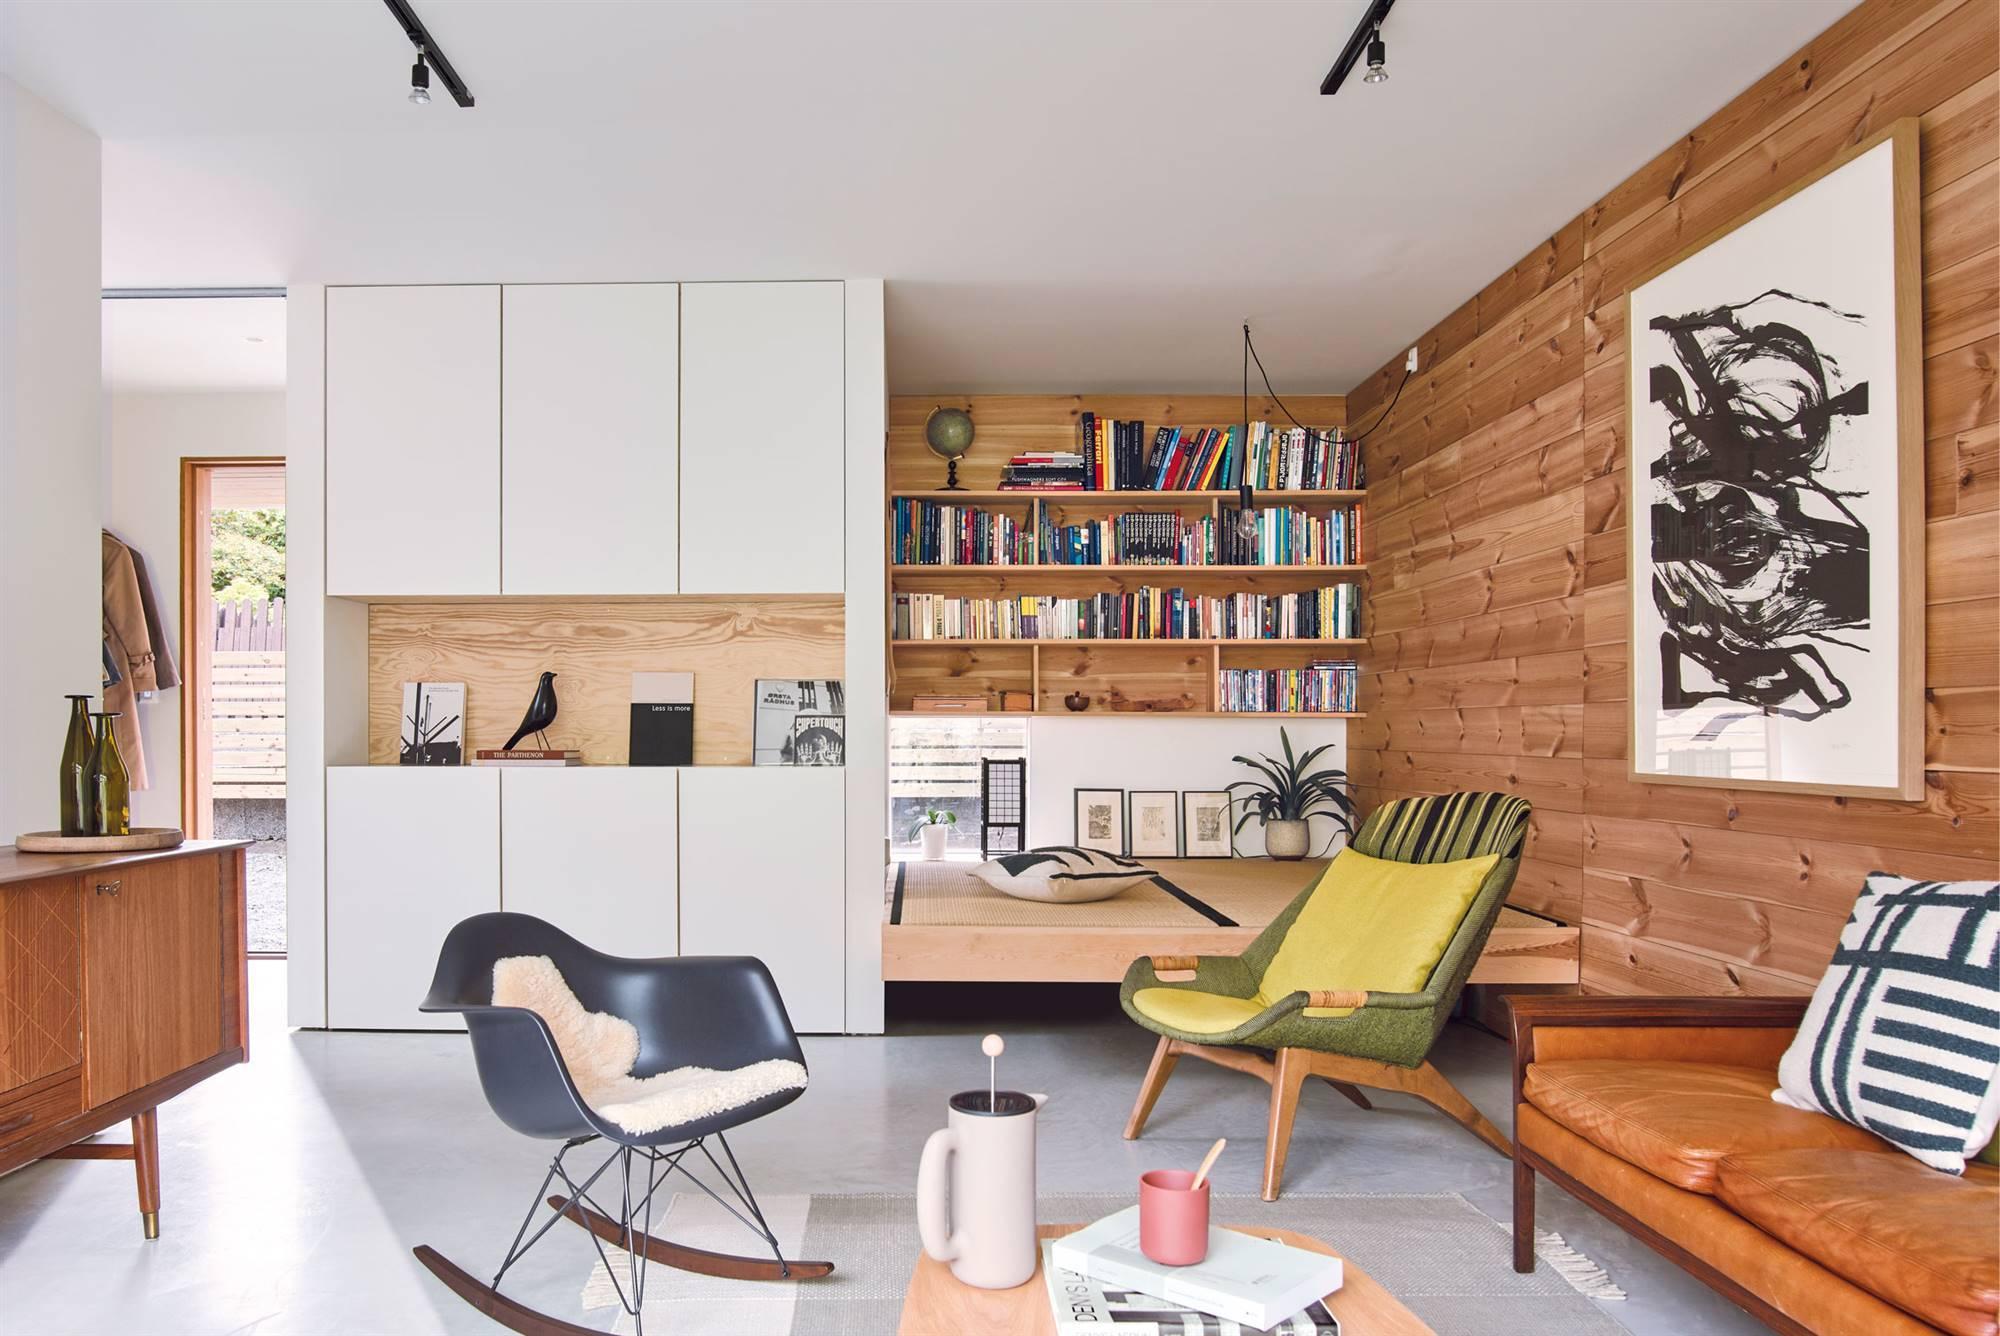 Muebles a medida modernos